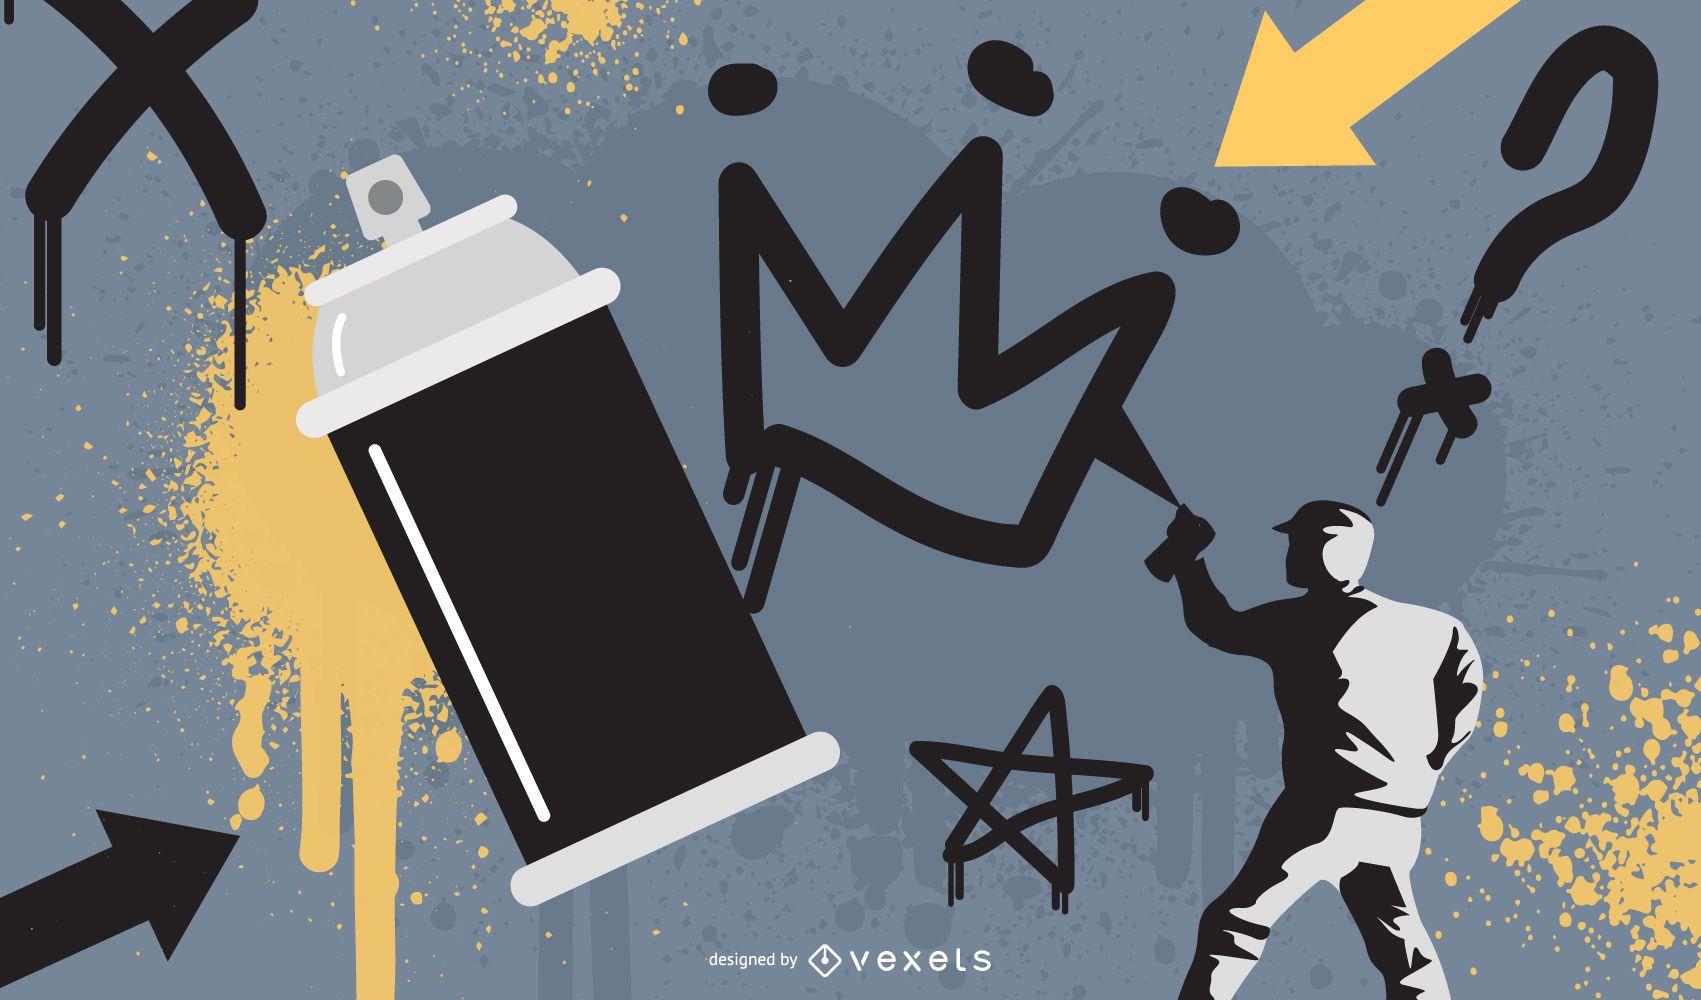 Graffiti paint illustration design